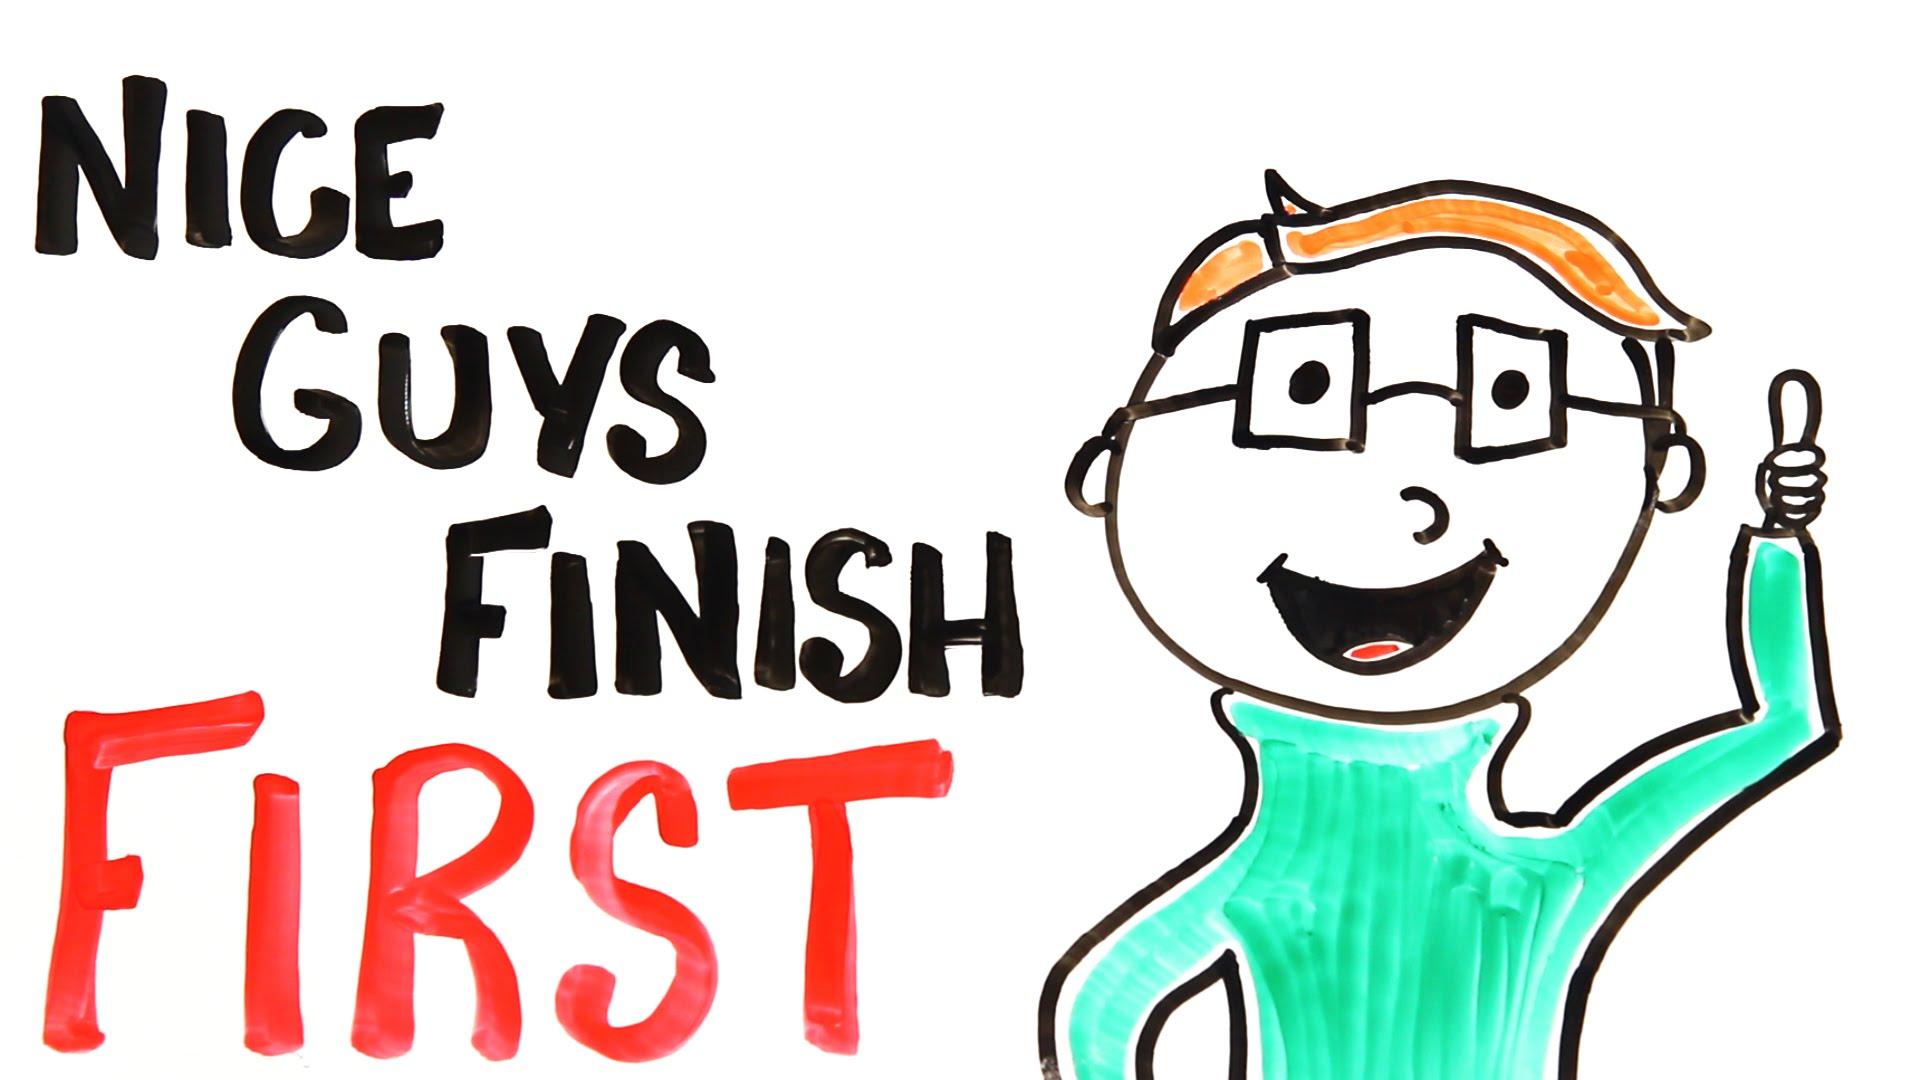 finishfirst